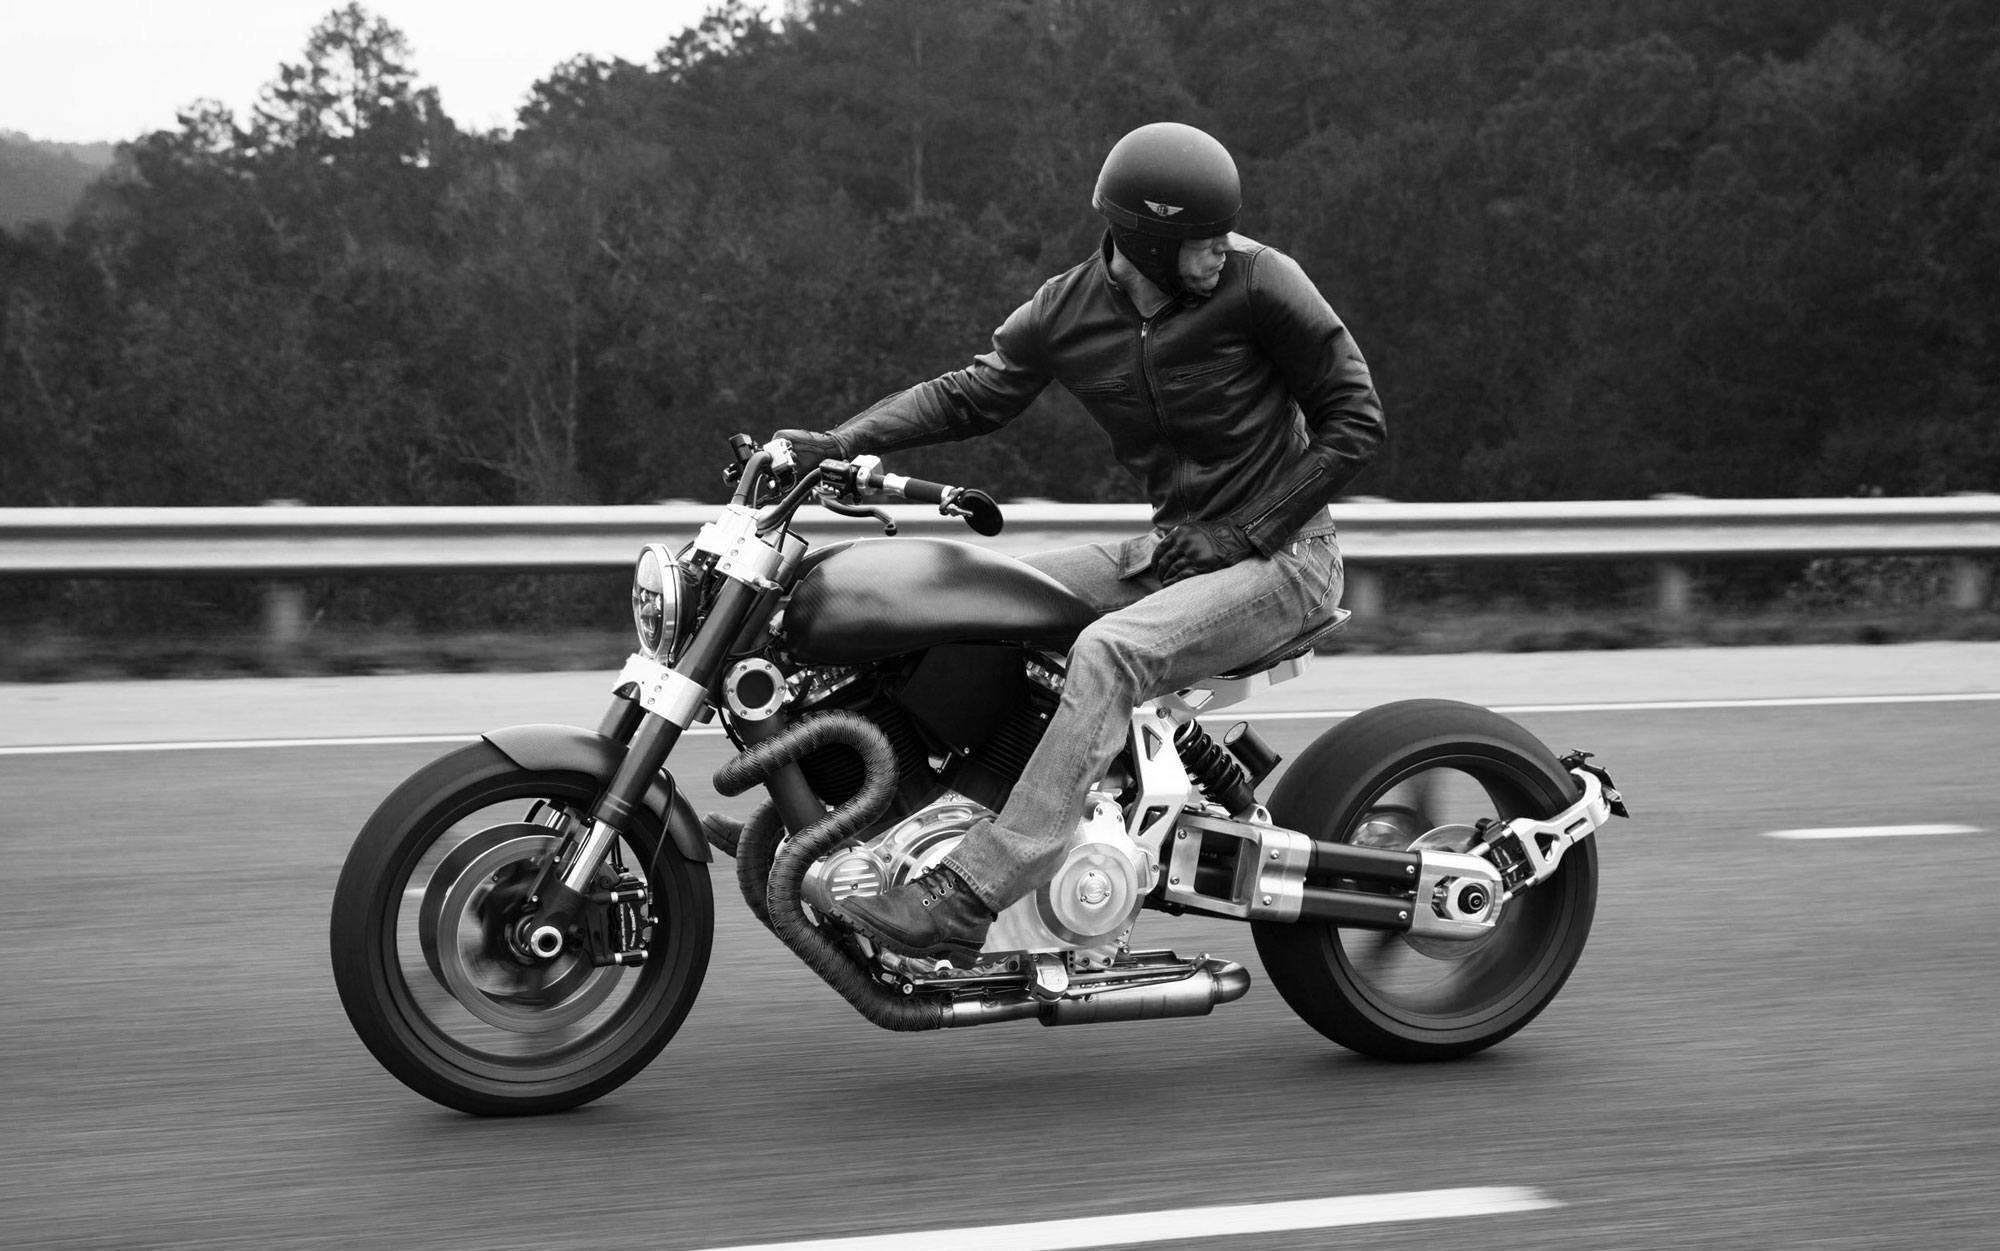 CONFEDERATE MOTORCYCLE superbike custom bike motorbike race racing hot rod  rods speedster cafe racer wallpaper     742620   WallpaperUP